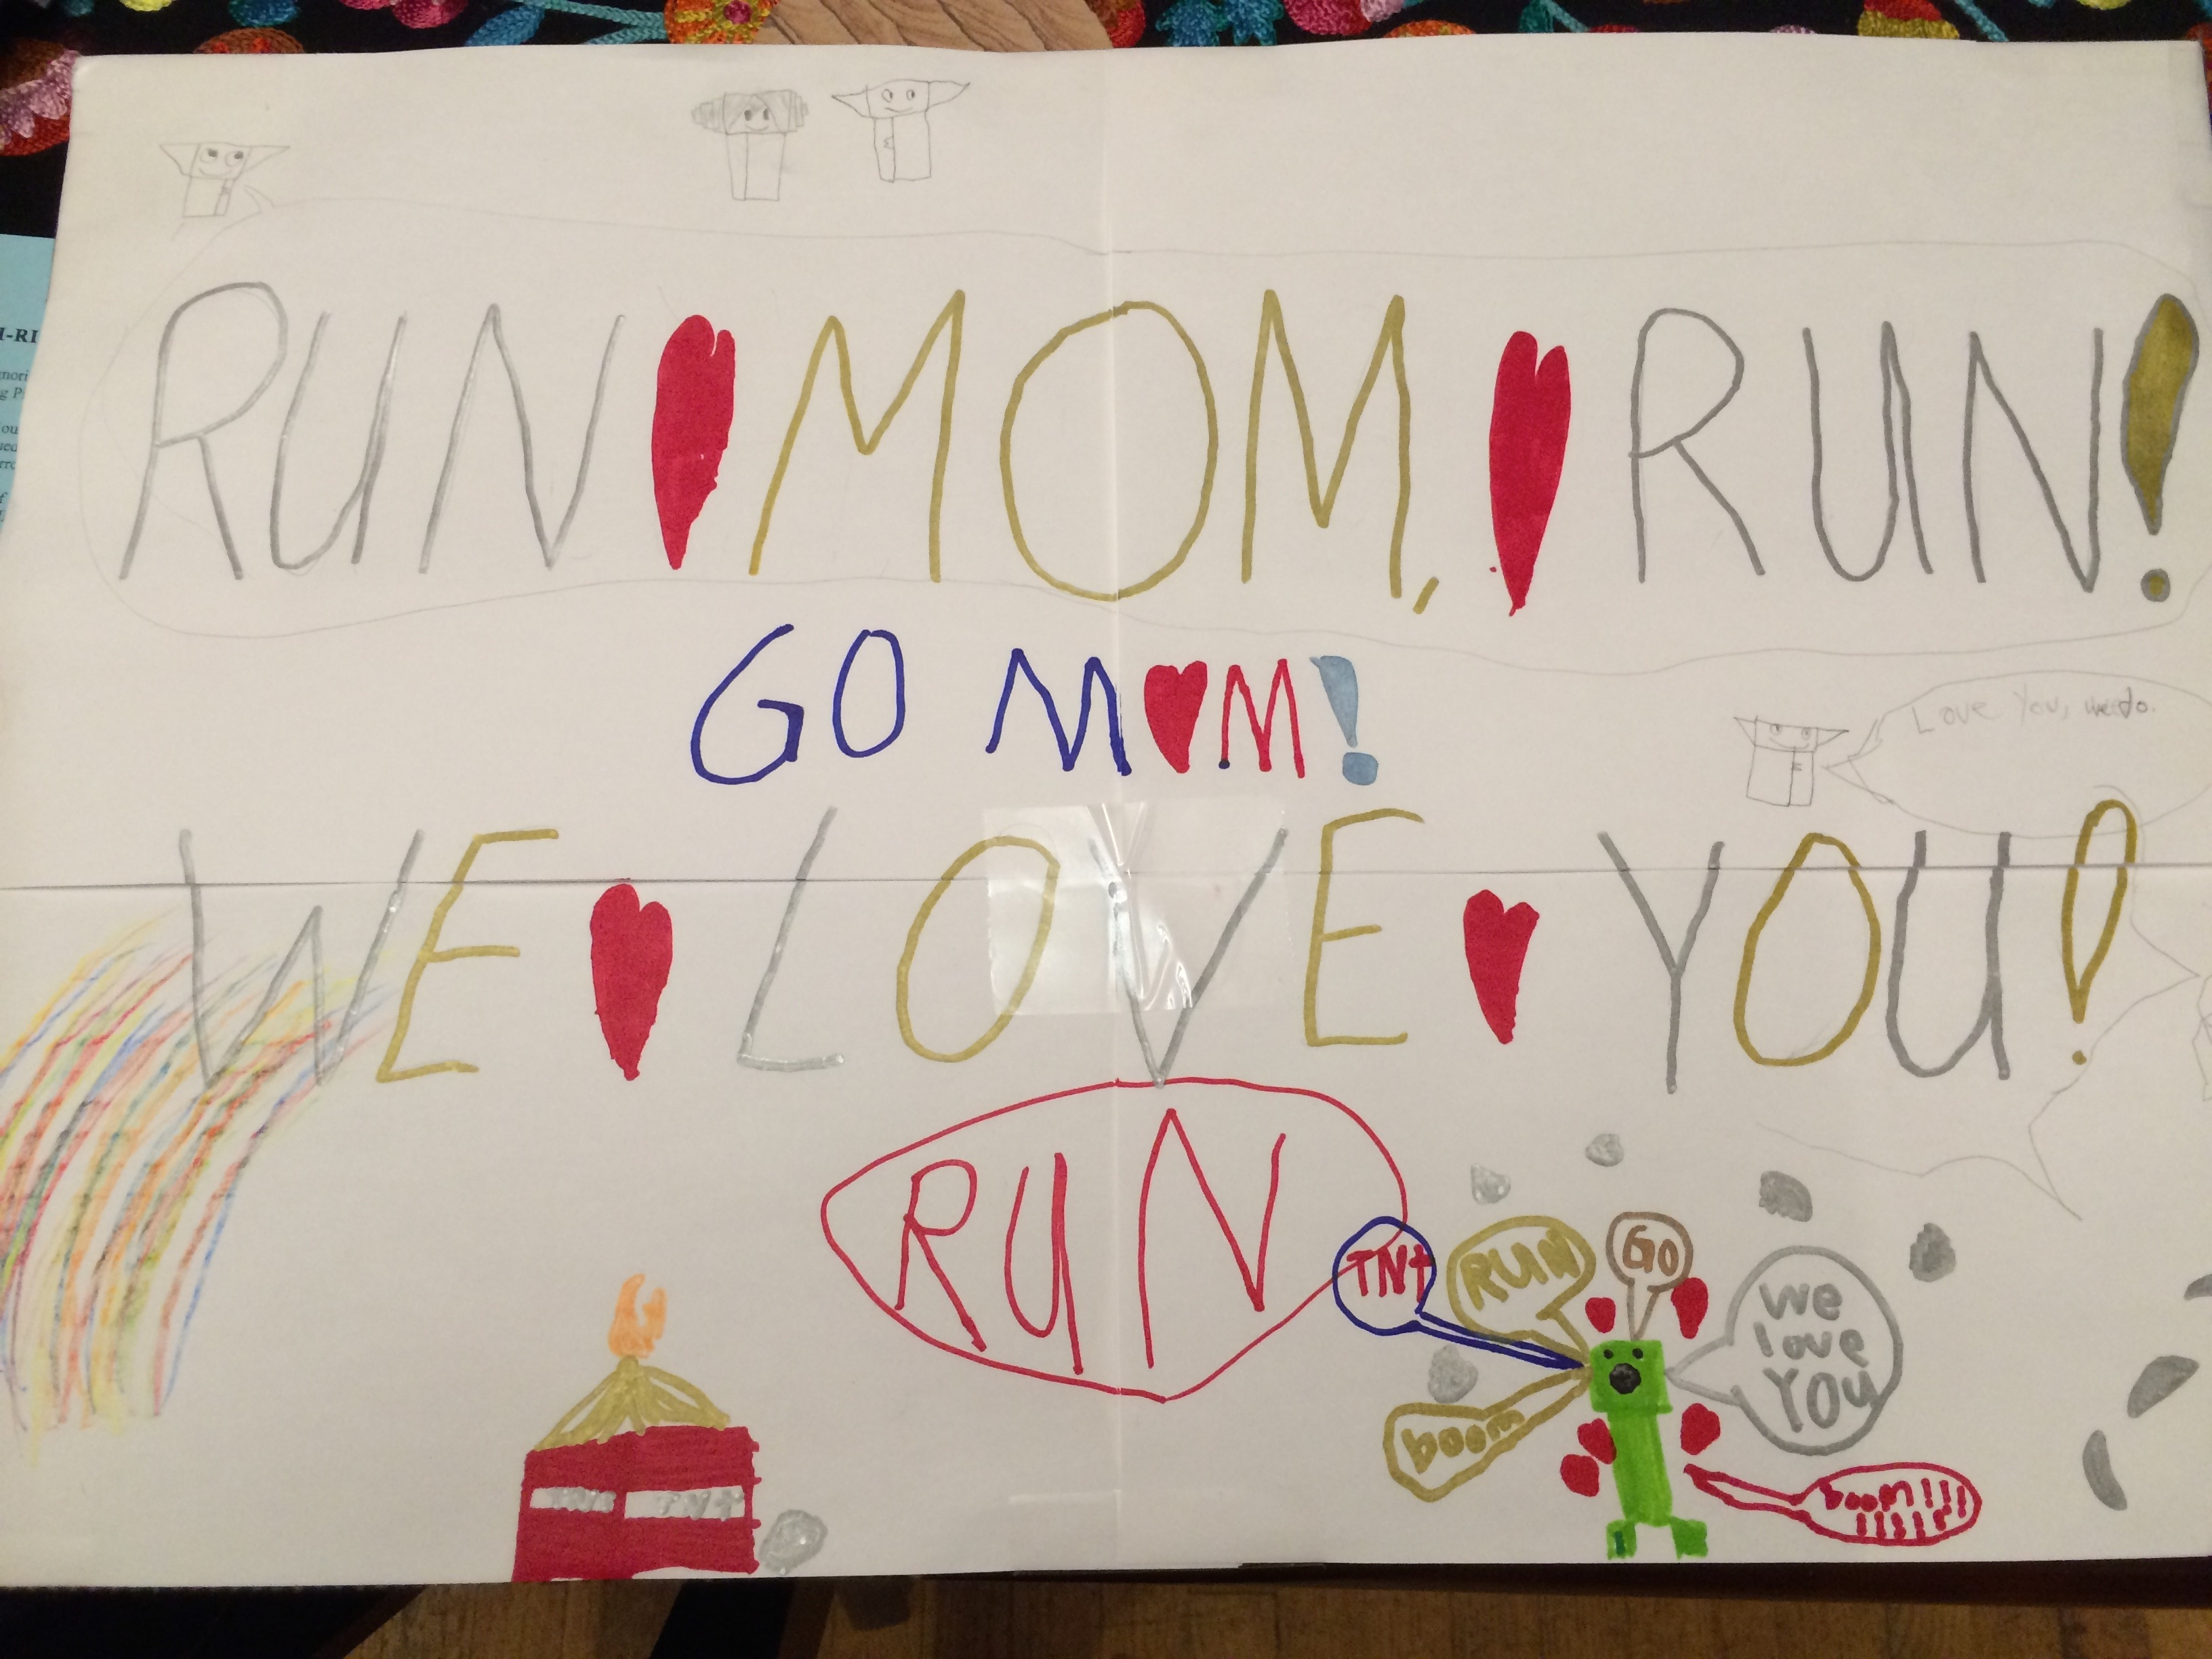 LA-Marathon-Cheer-Sign